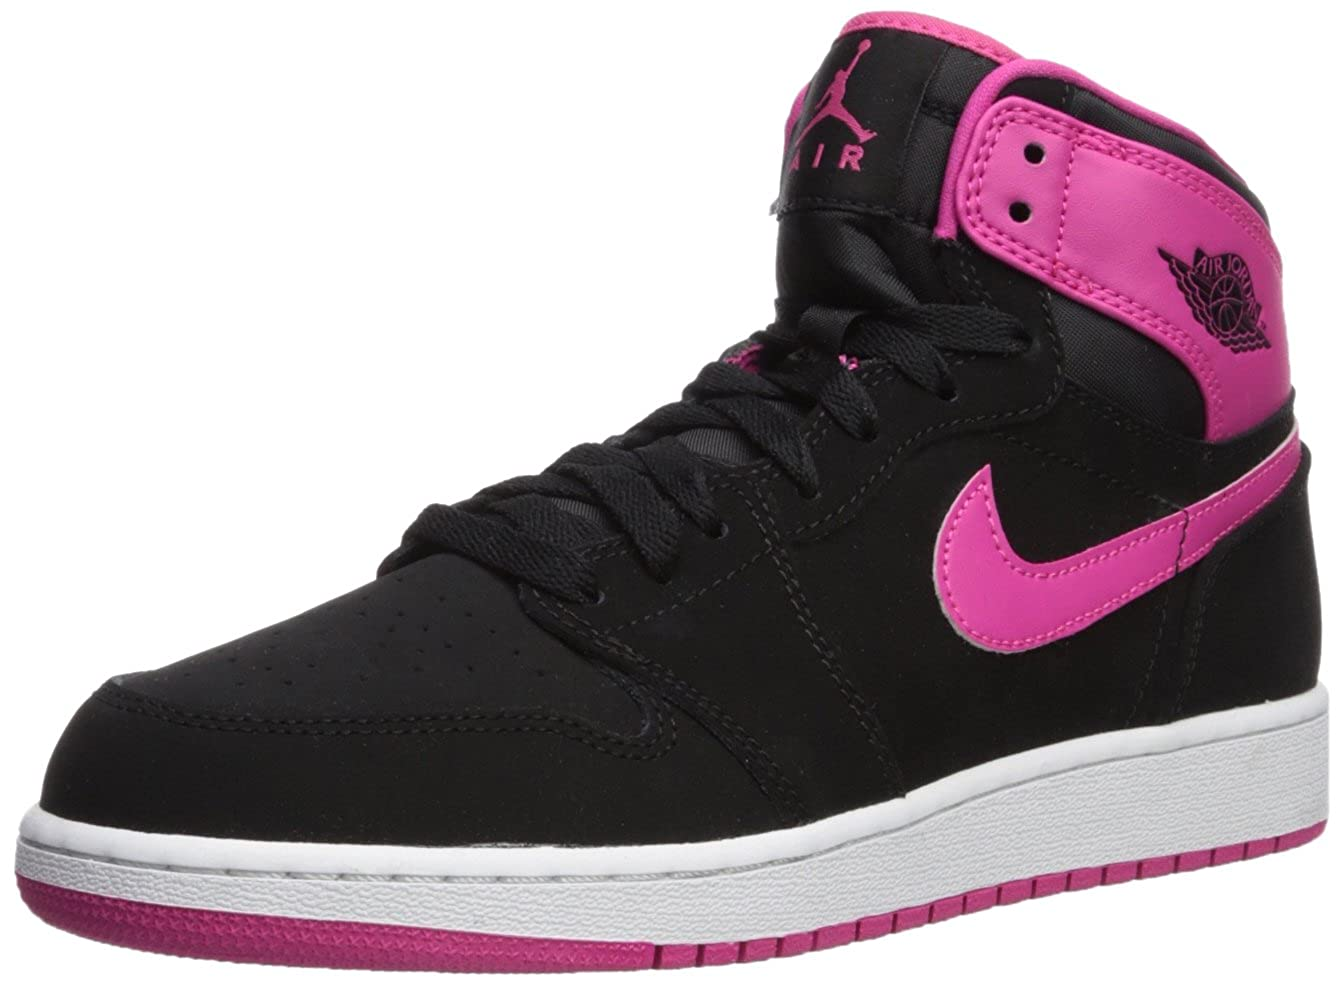 89c1d600fa1f0 Amazon.com | Jordan Kids' Air 1 Retro High Gg | Sneakers